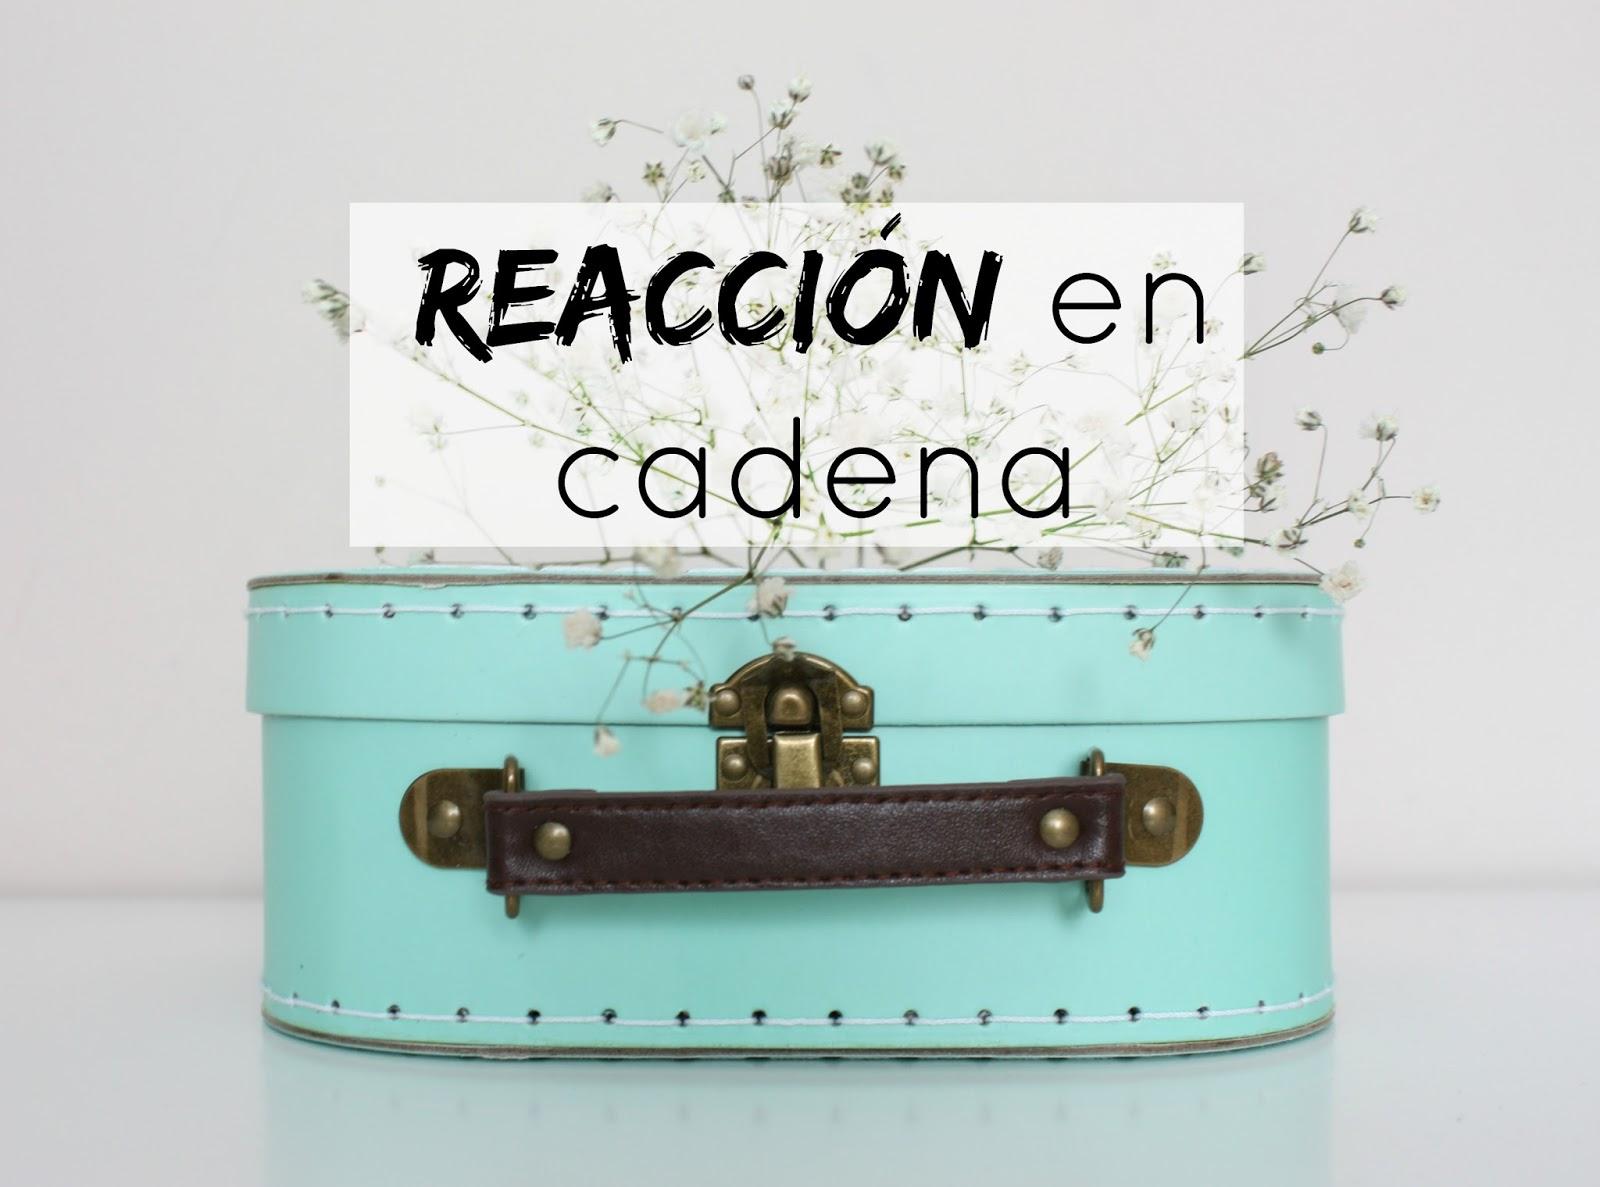 http://mediasytintas.blogspot.com/2015/04/reaccion-en-cadena.html